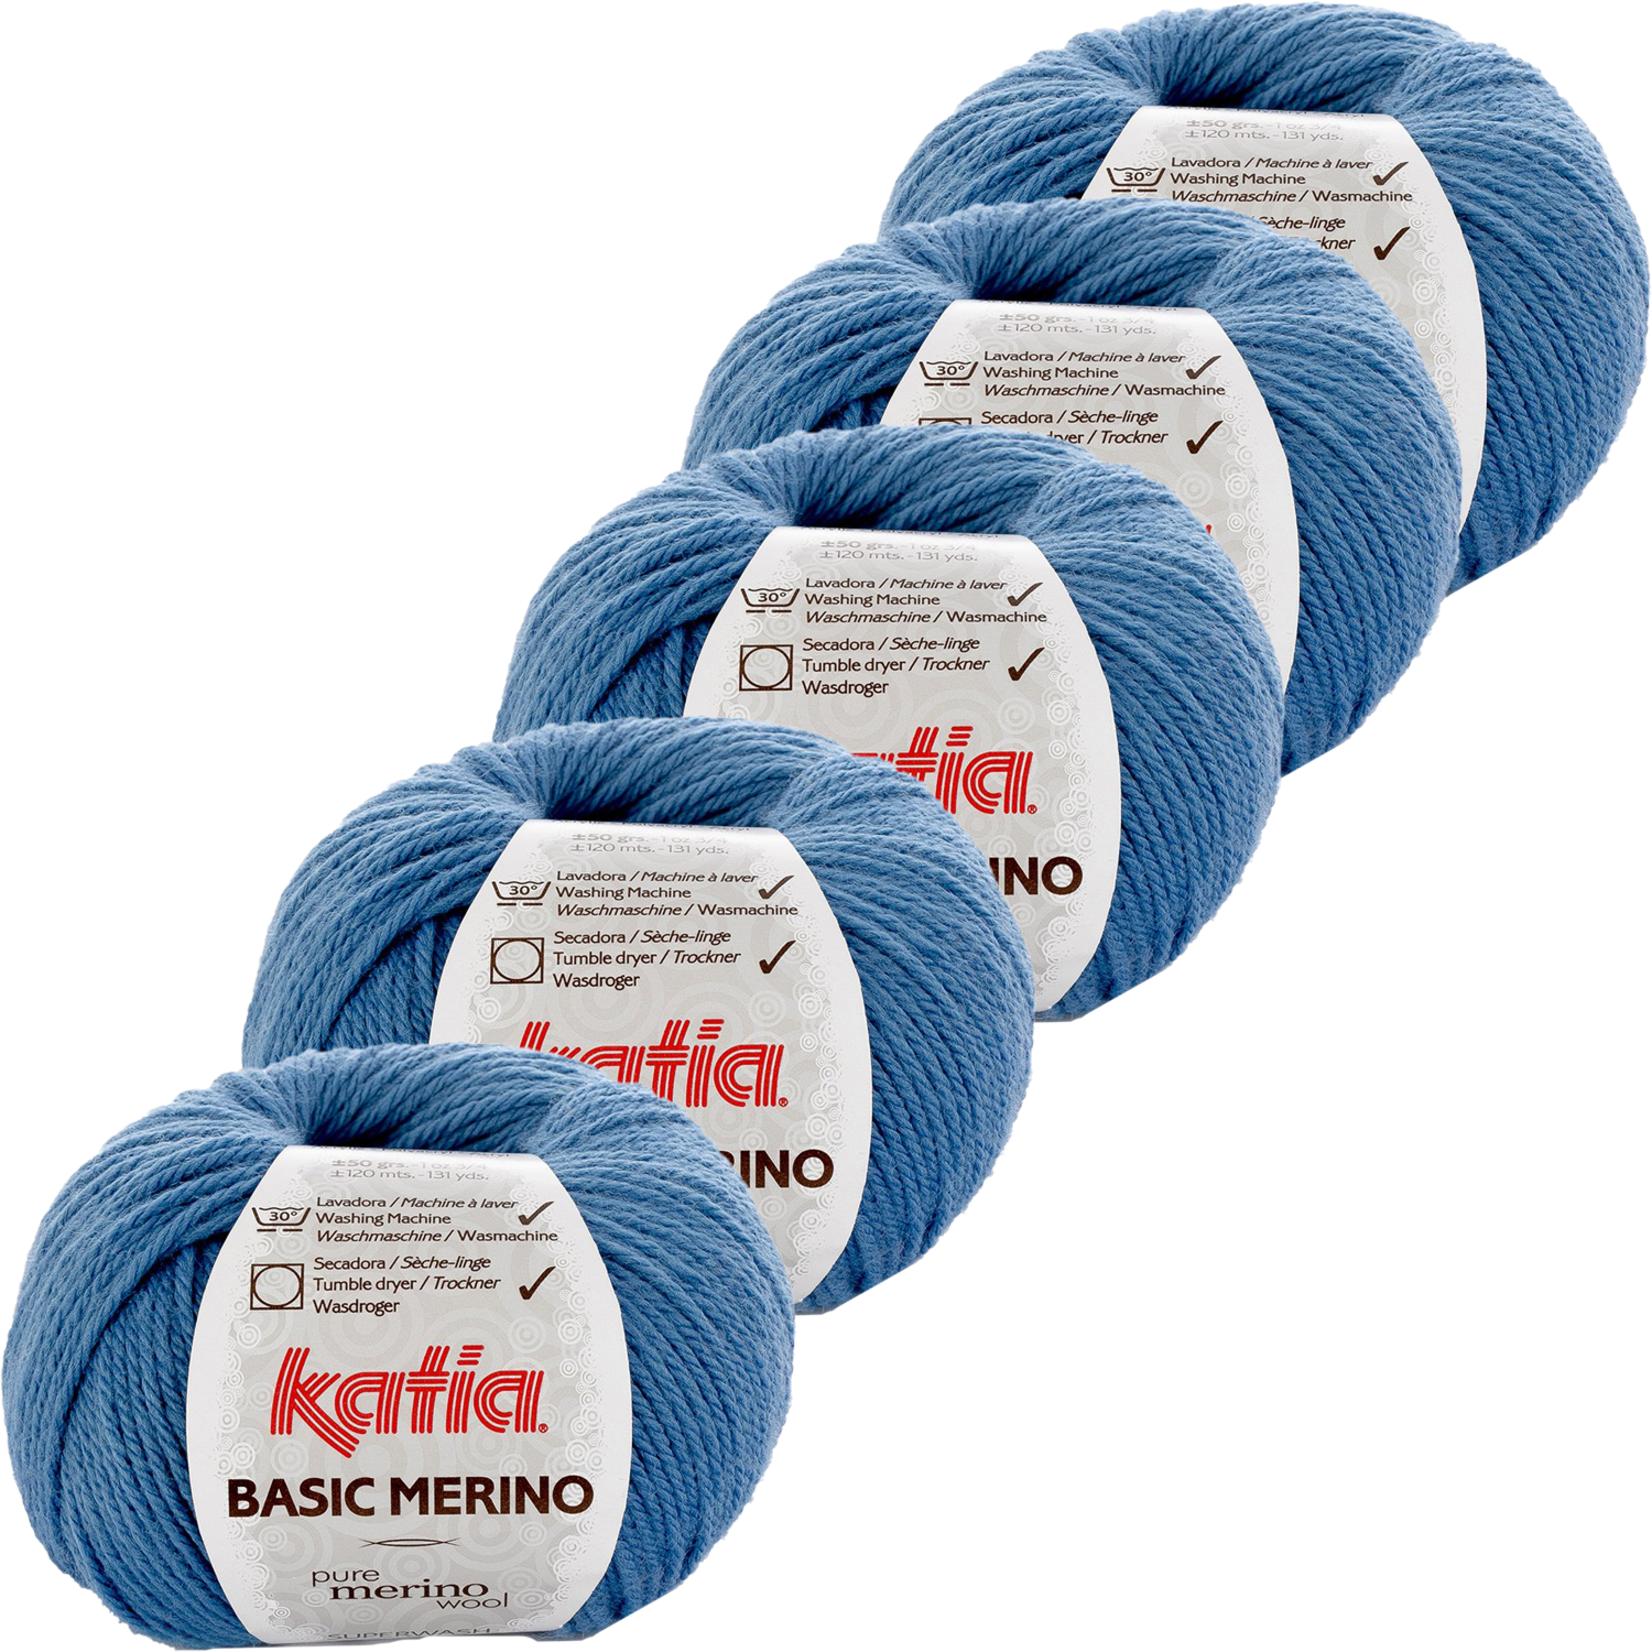 Katia Basic Merino - kleur 33_Licht blauw - bundel 5 bollen 50 gr.  van 120 m.